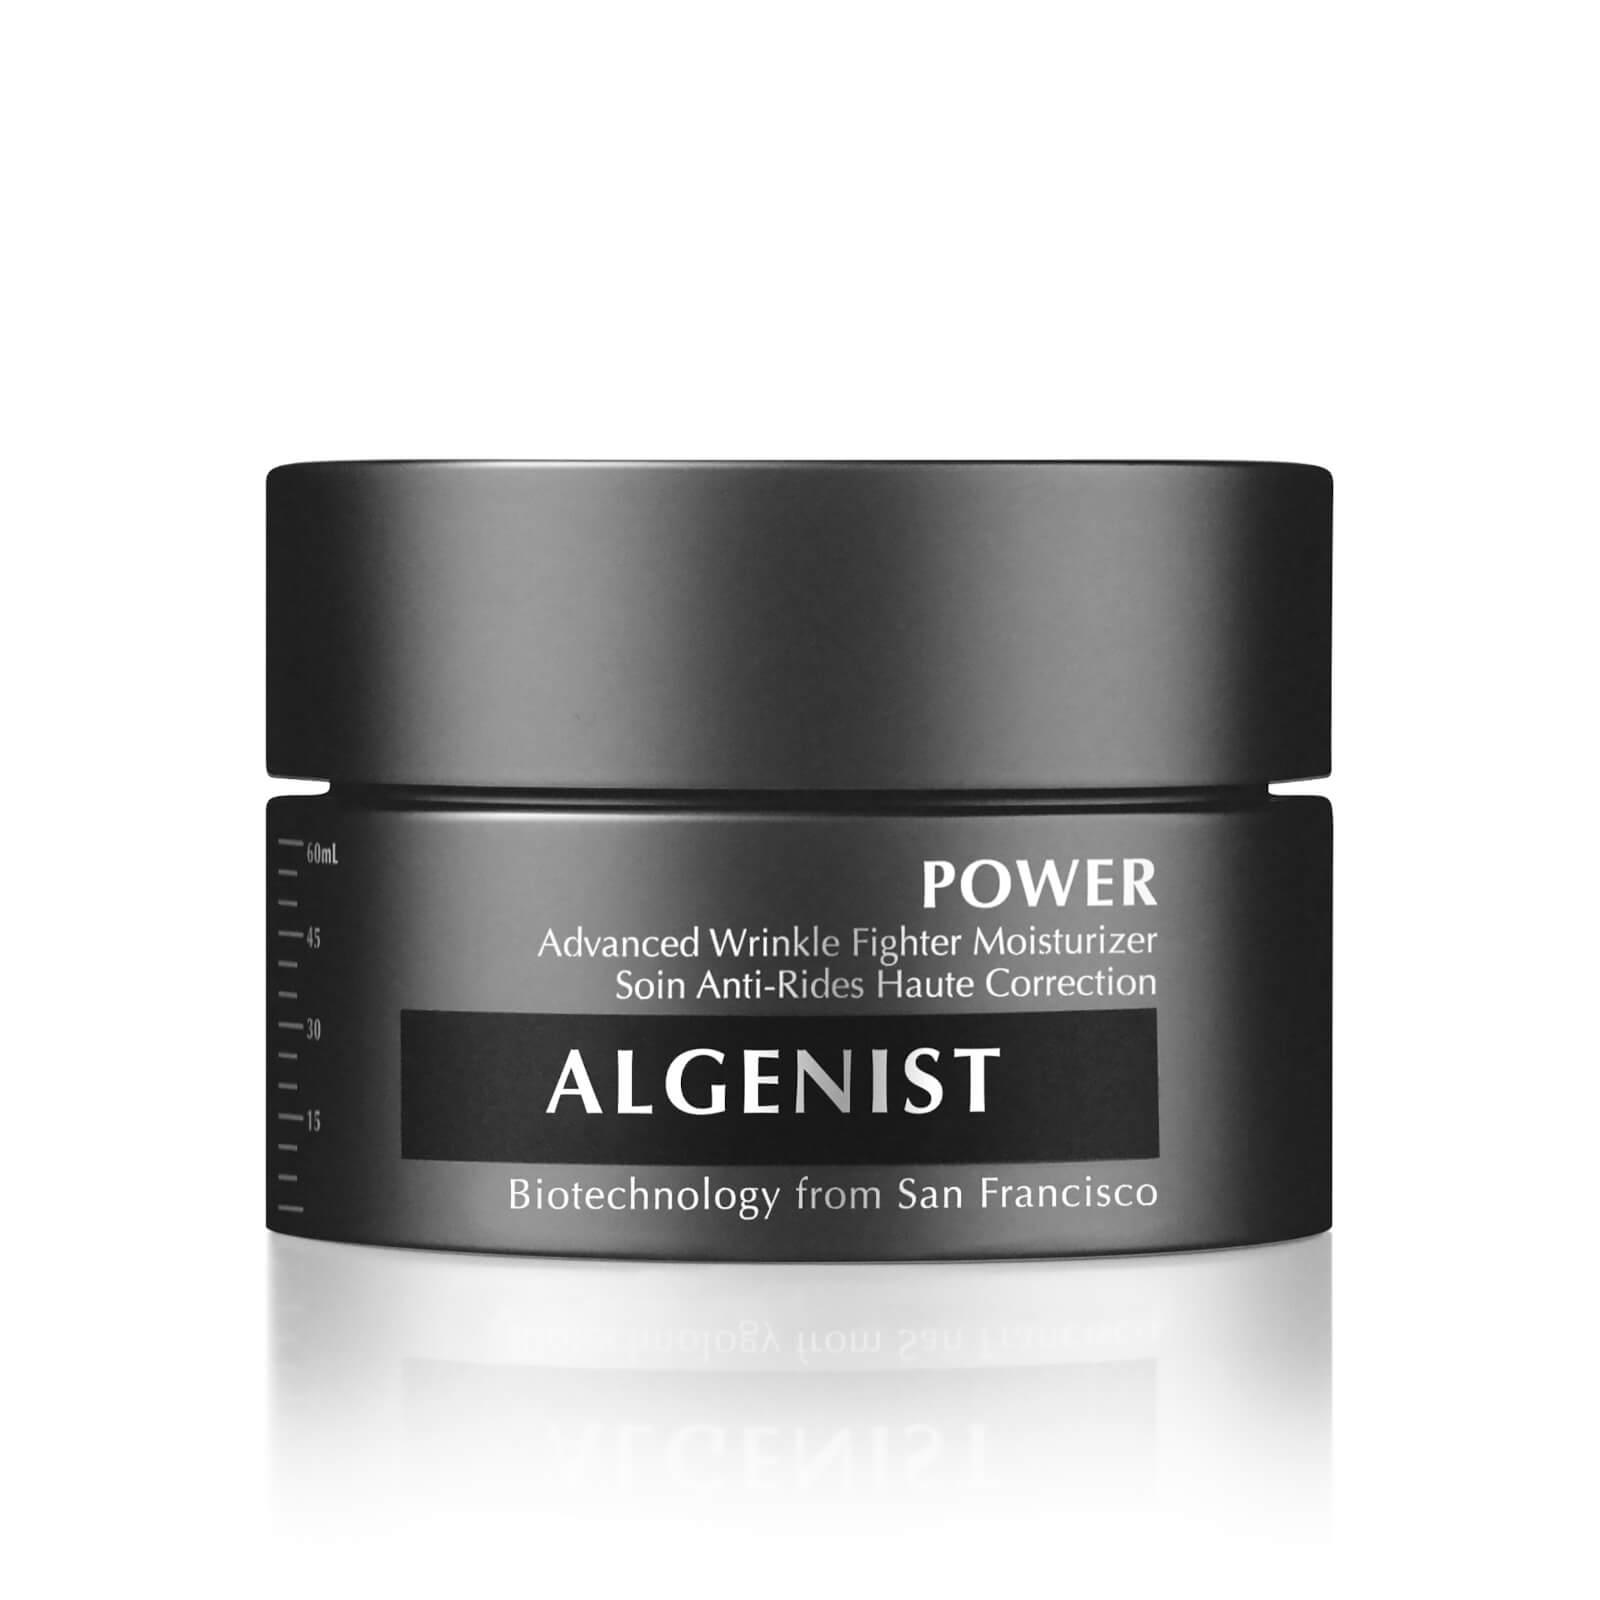 algenist power advanced wrinkle fighter moisturizer 2 fl oz